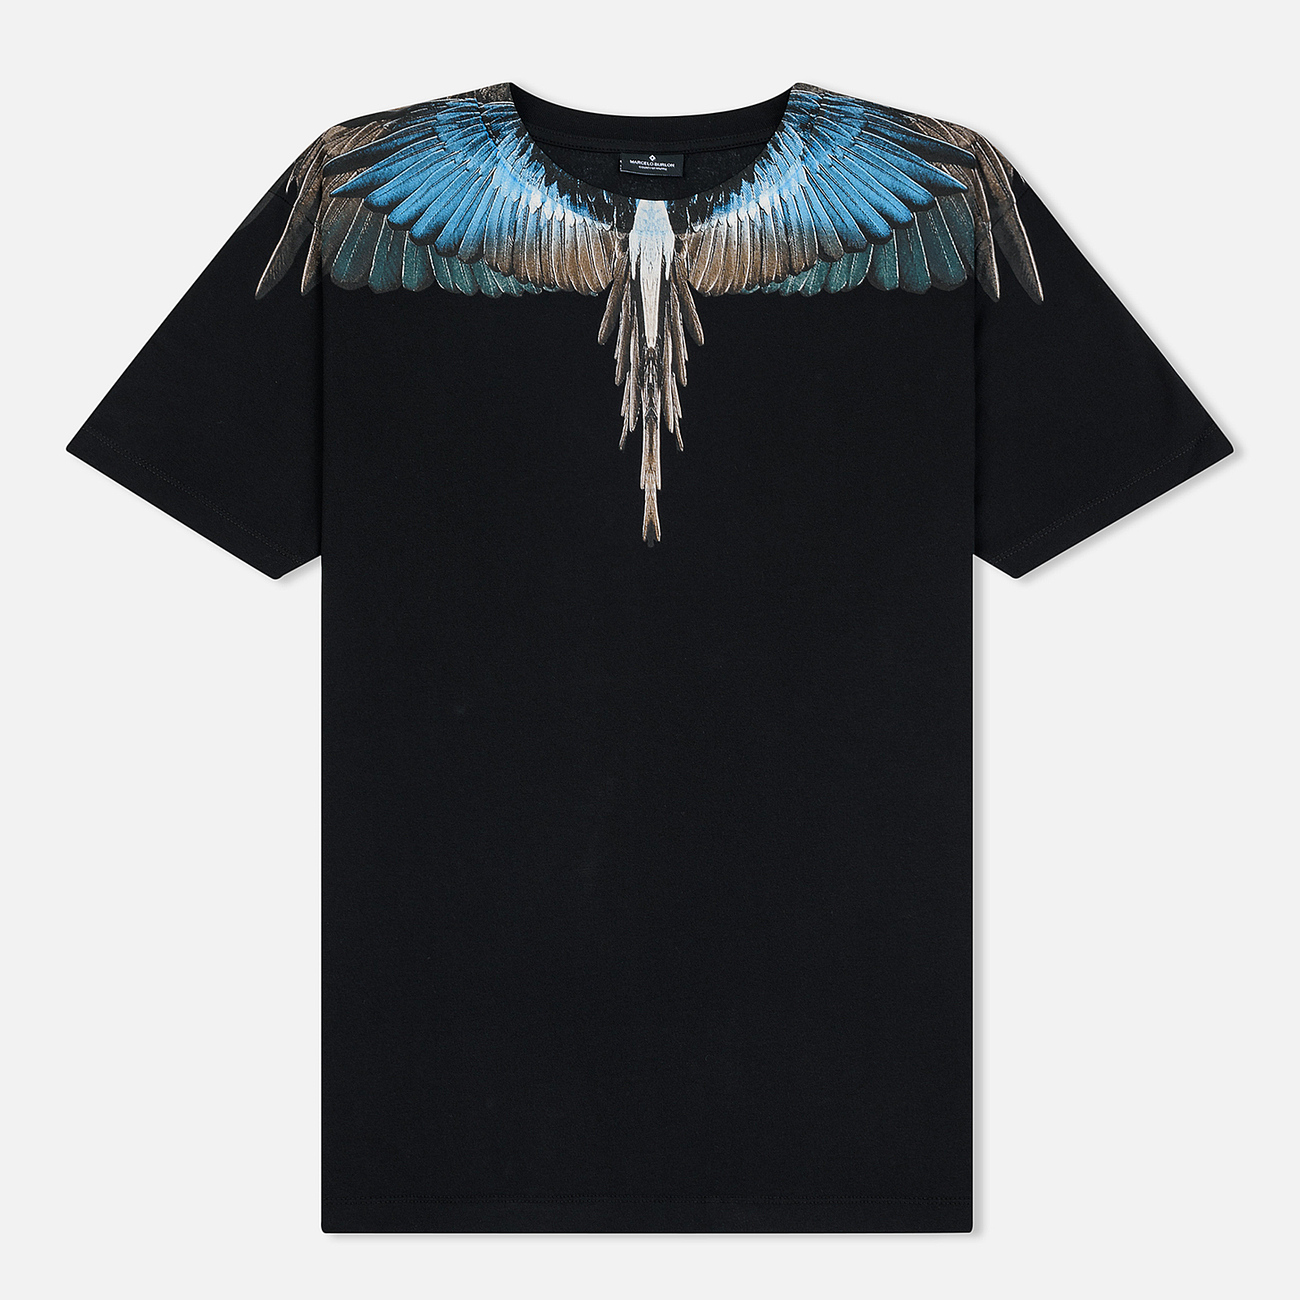 Мужская футболка Marcelo Burlon Turquoise Wings Black/Multicolor